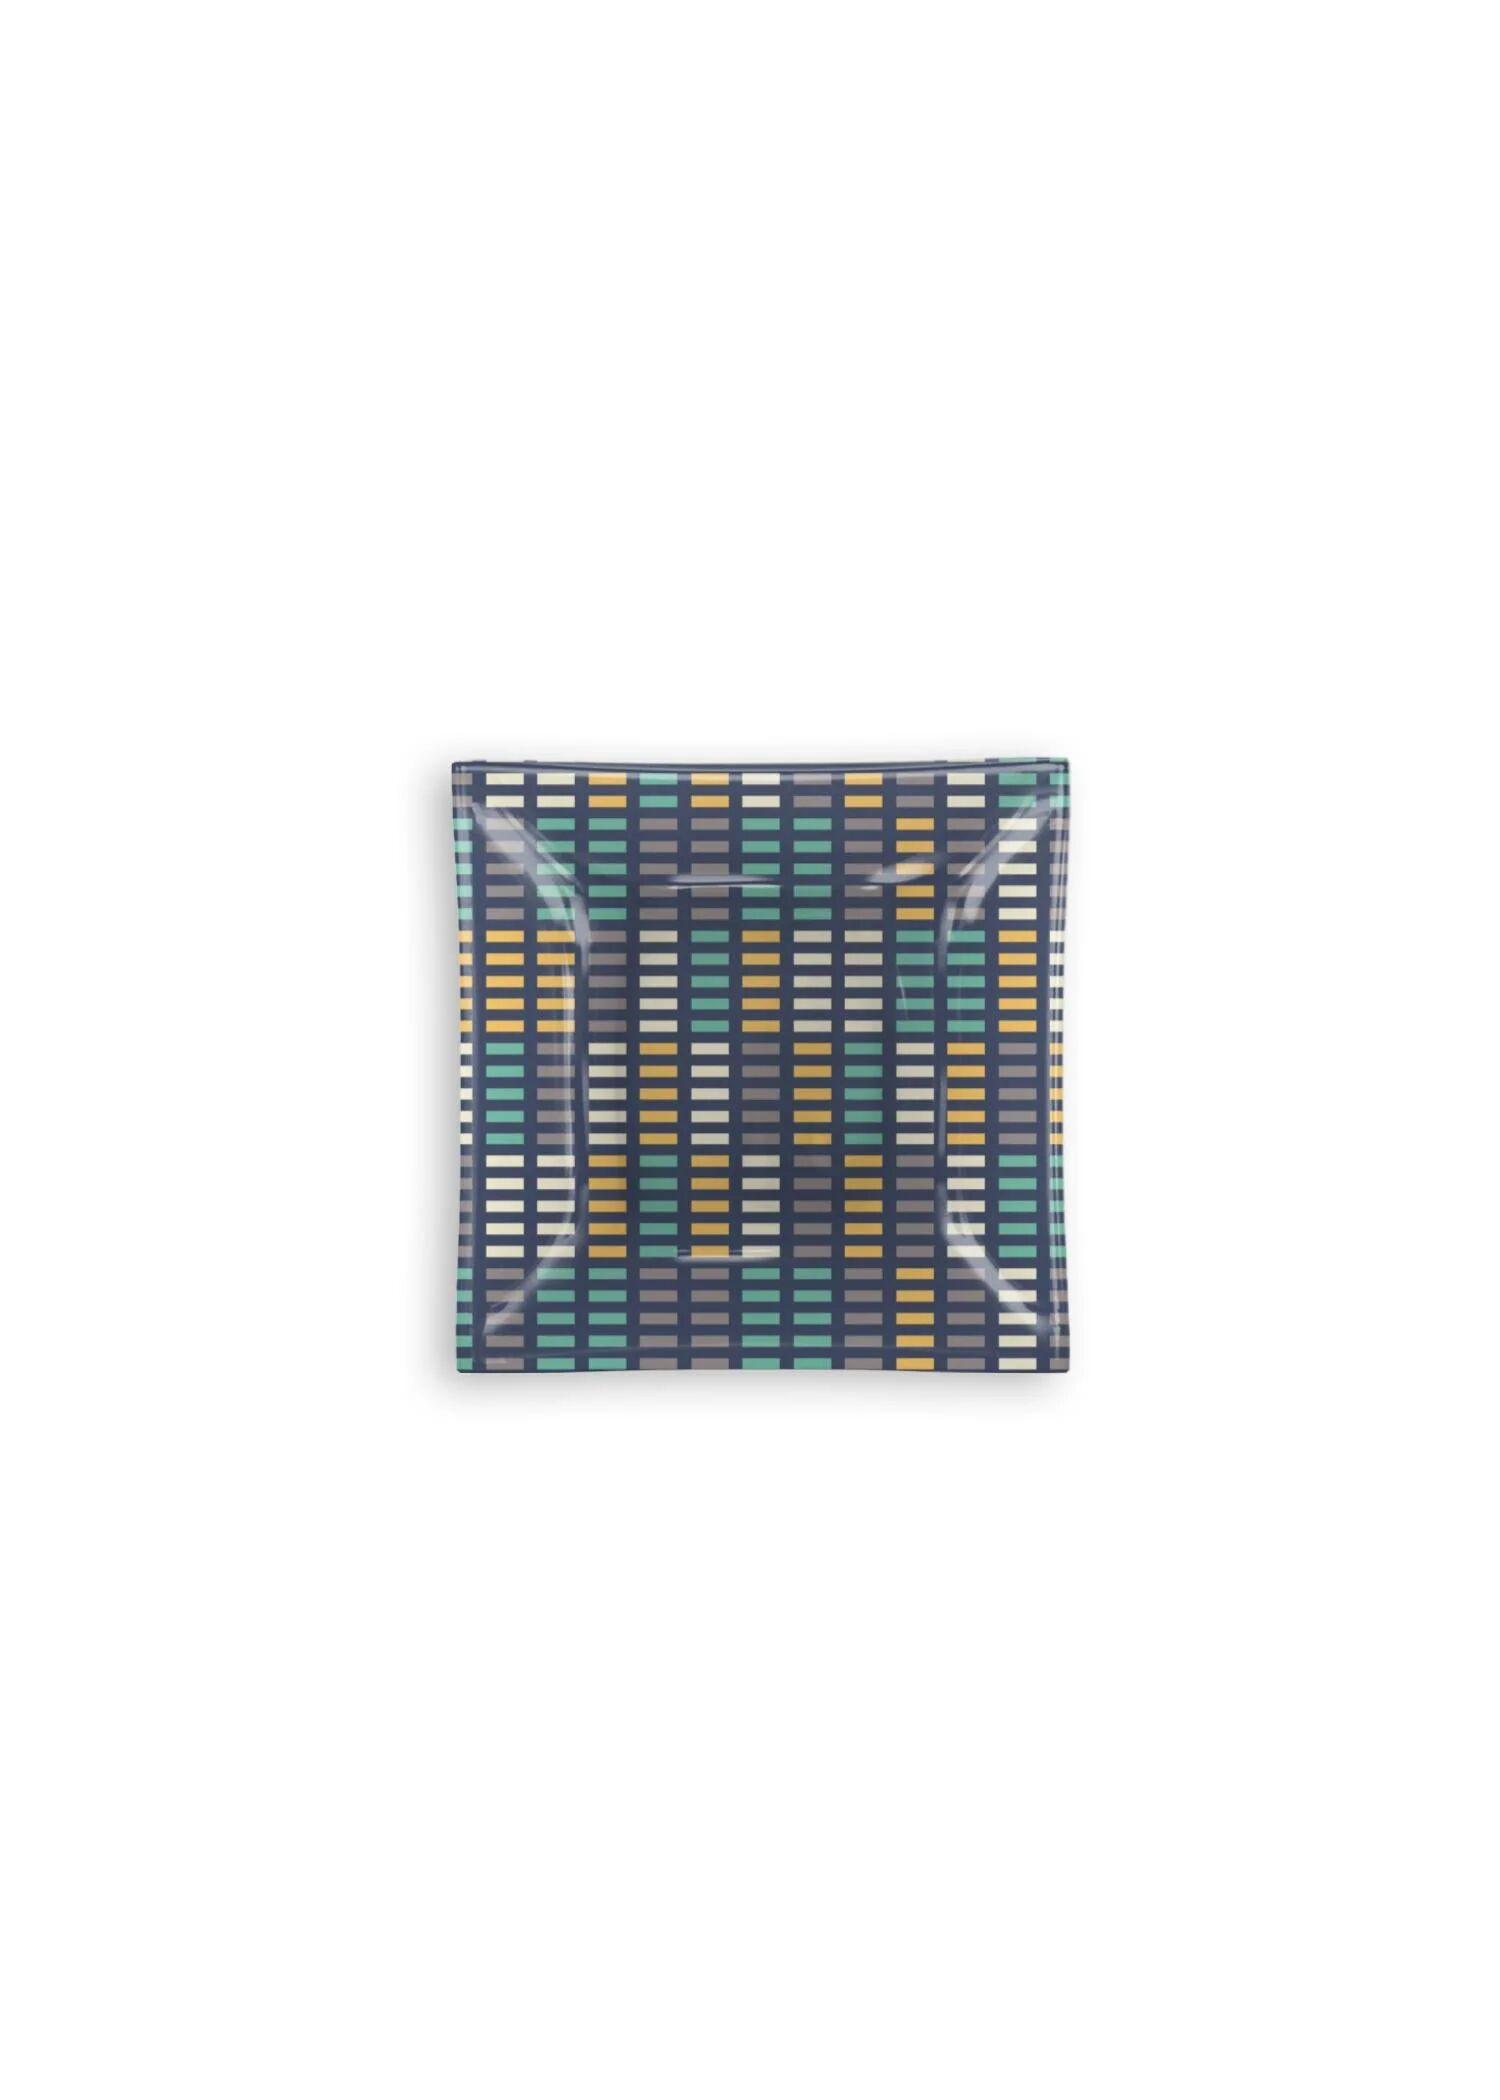 VIDA Square Glass Tray - Music Equalizer by VIDA Original Artist  - Size: Small